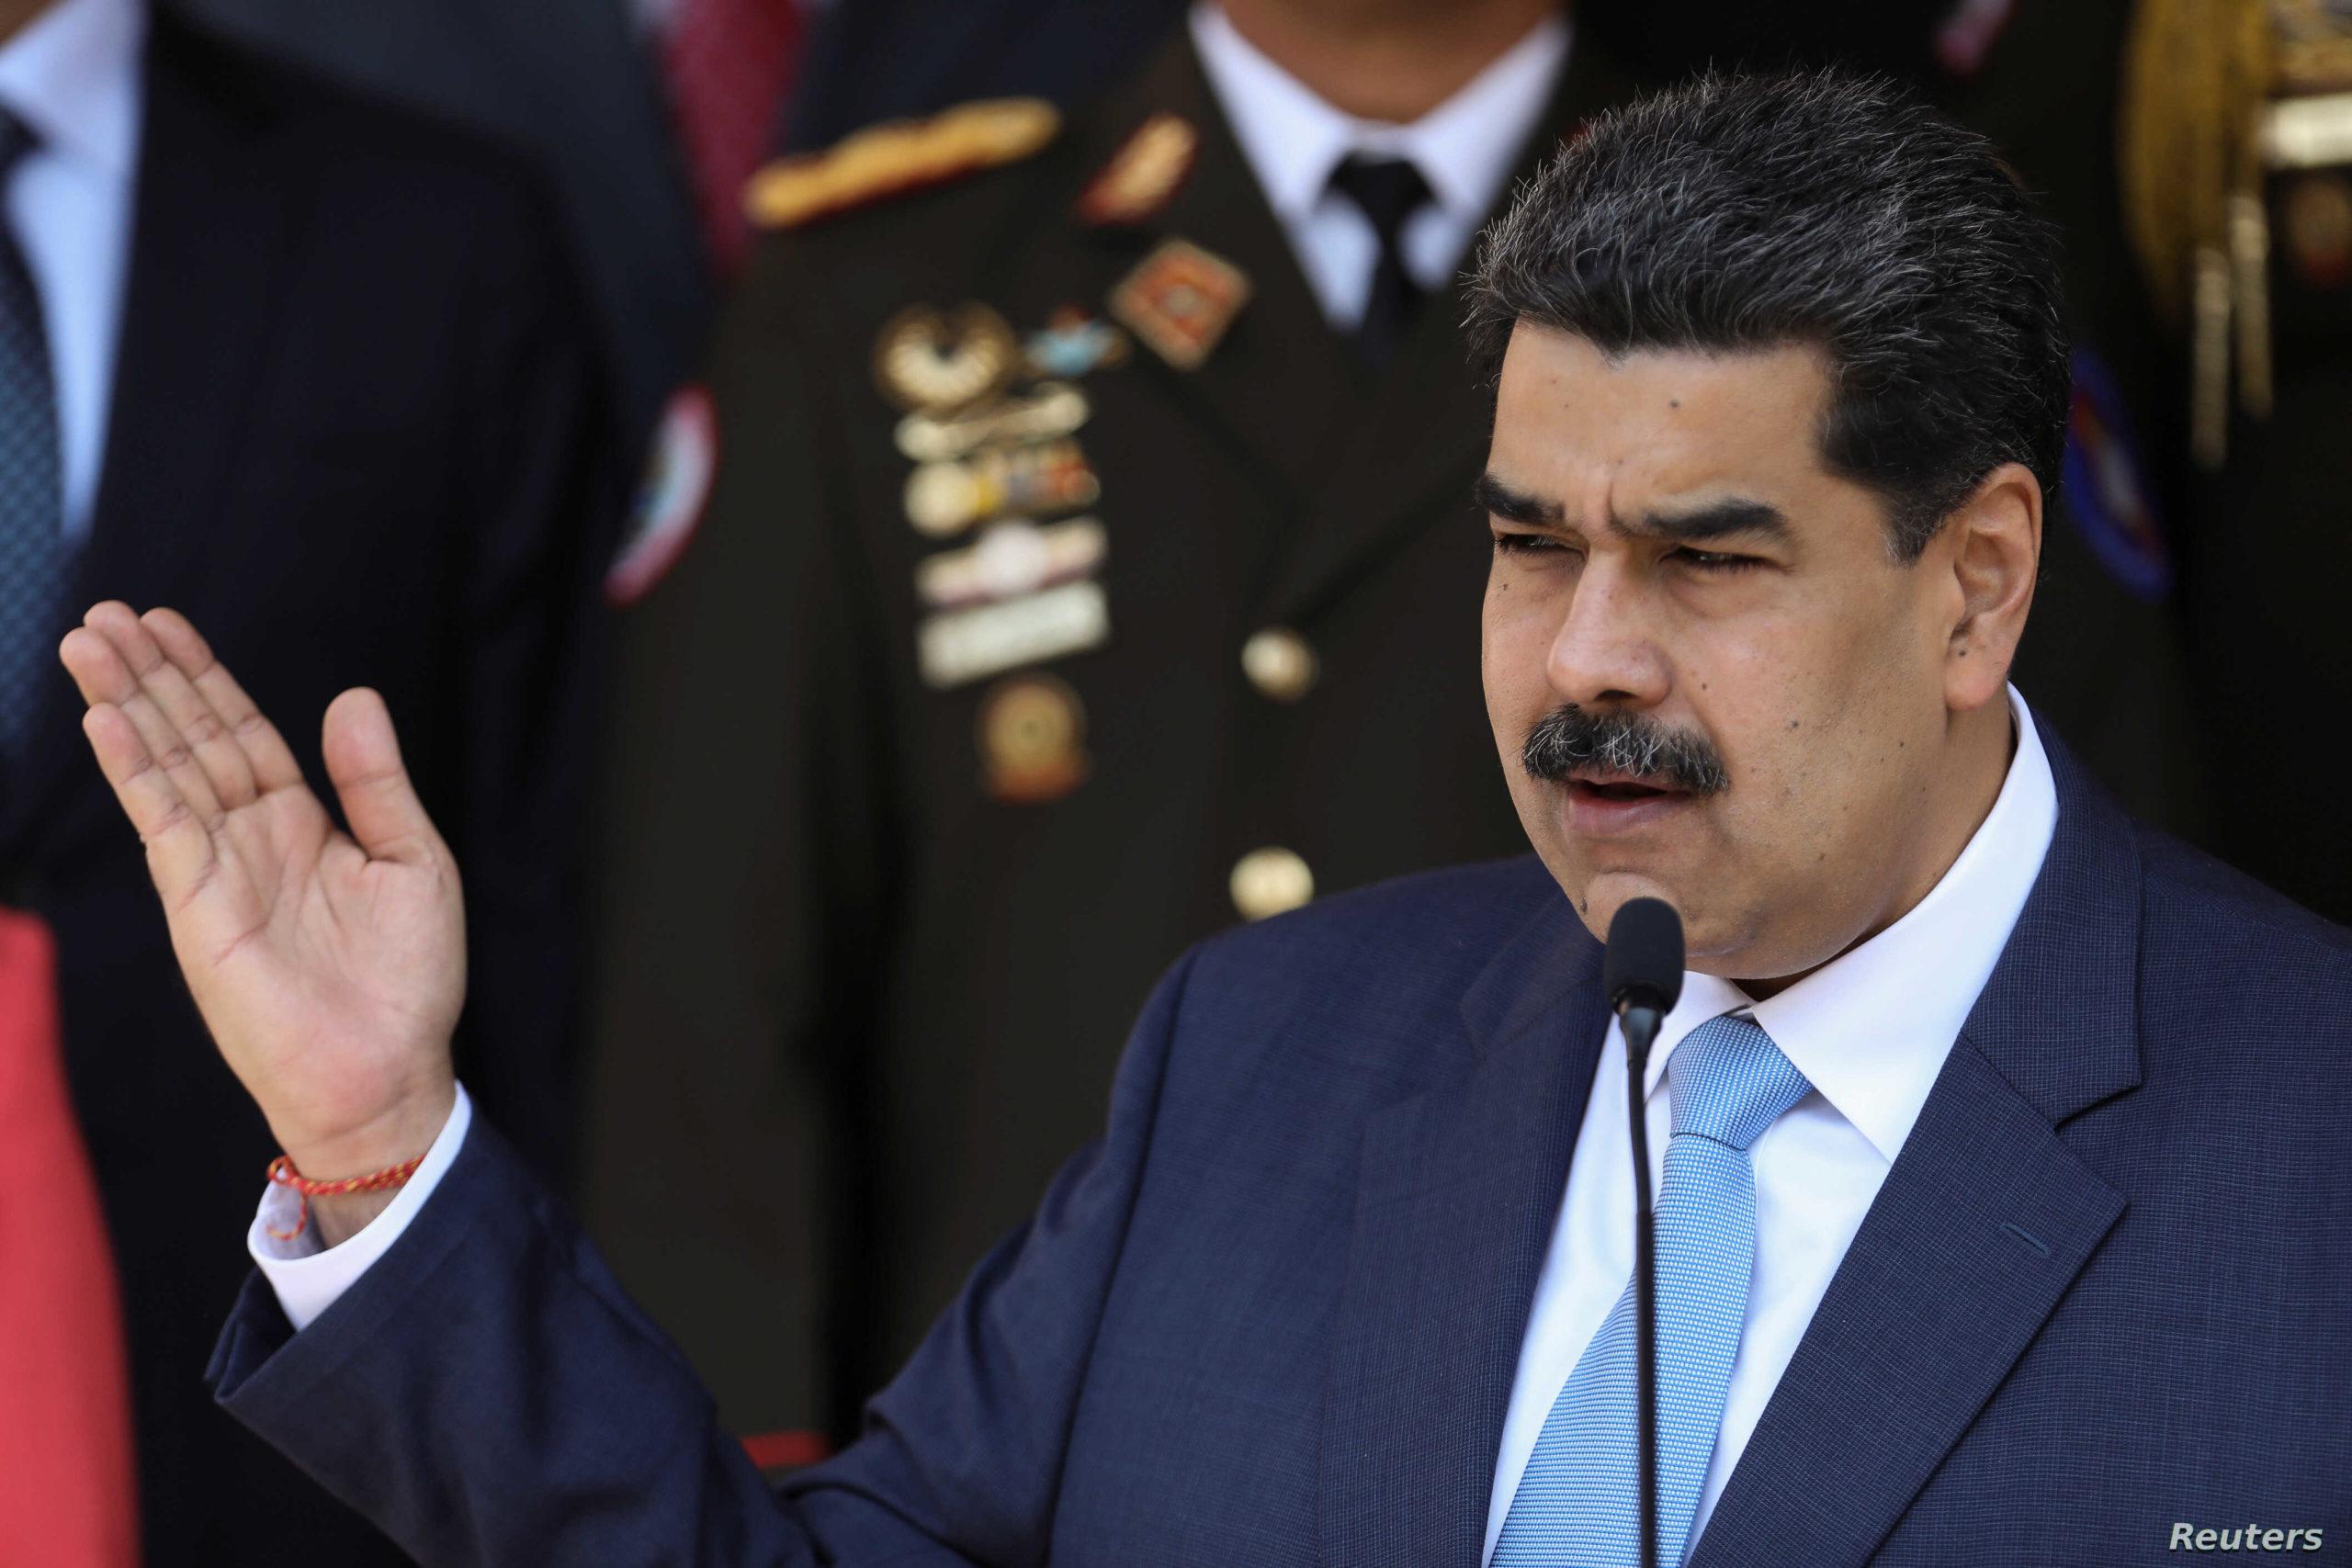 Averting The Road To Venezuela